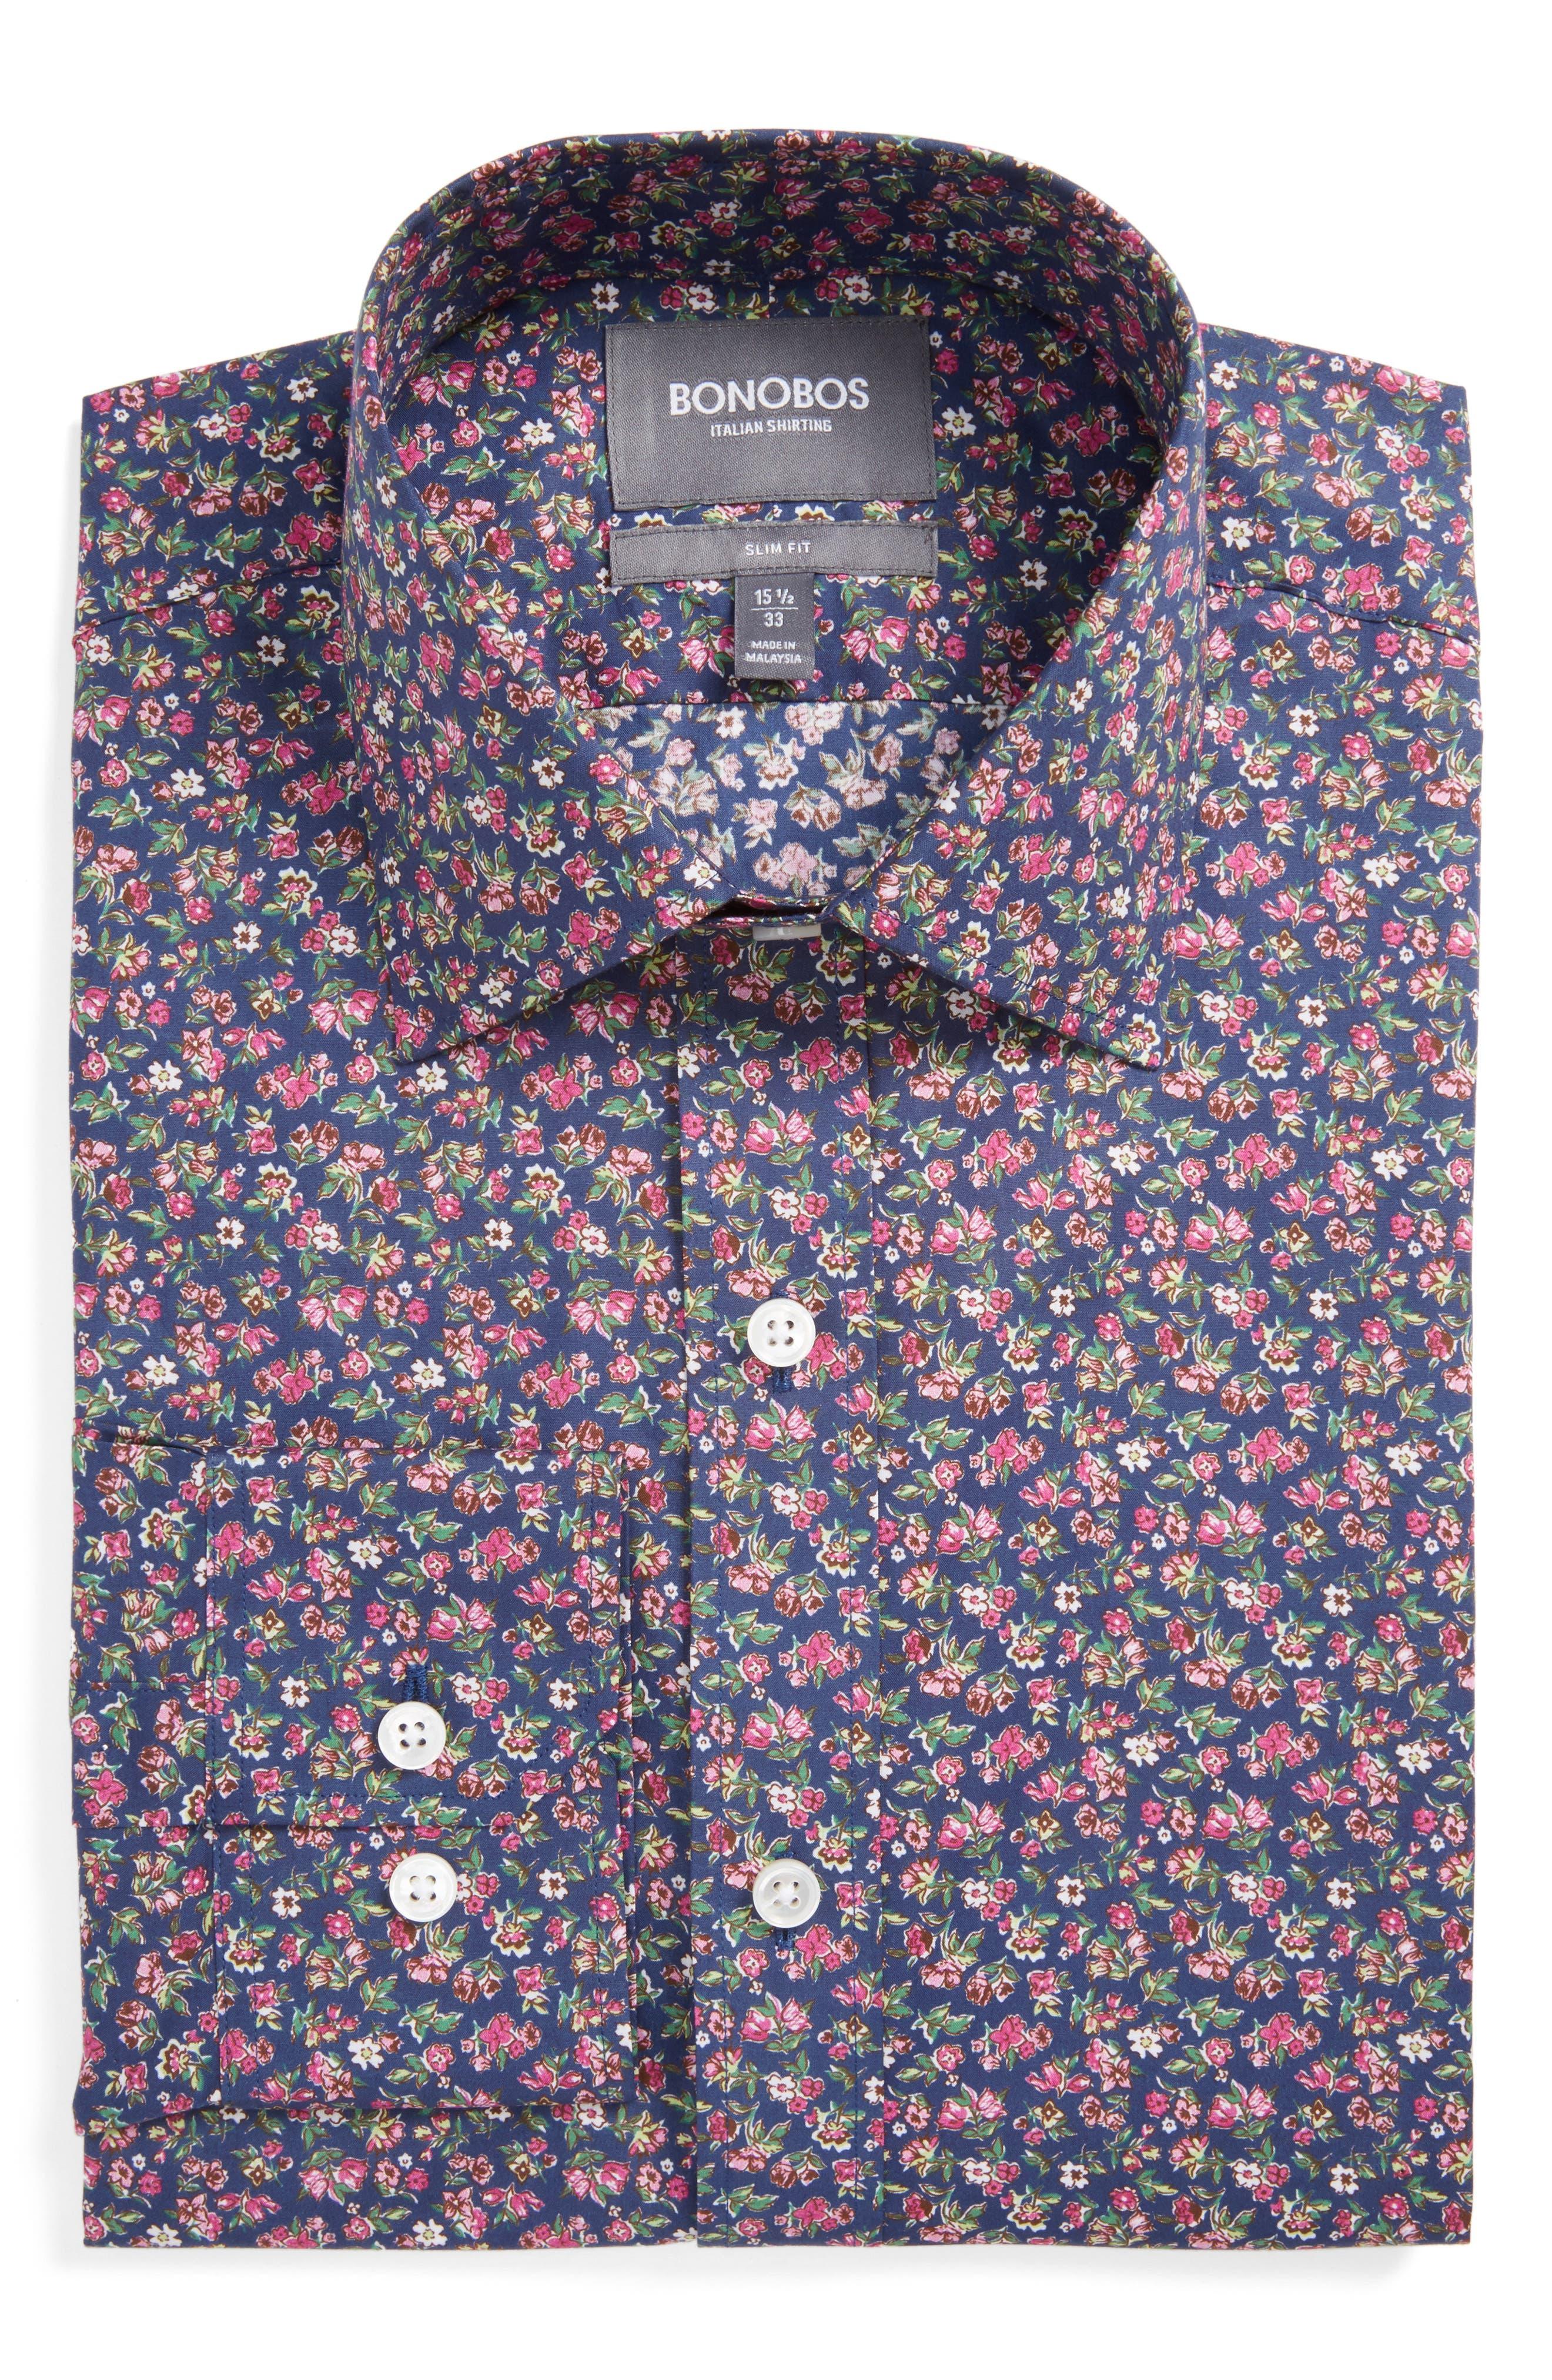 Main Image - Bonobos Americano Slim Fit Floral Dress Shirt